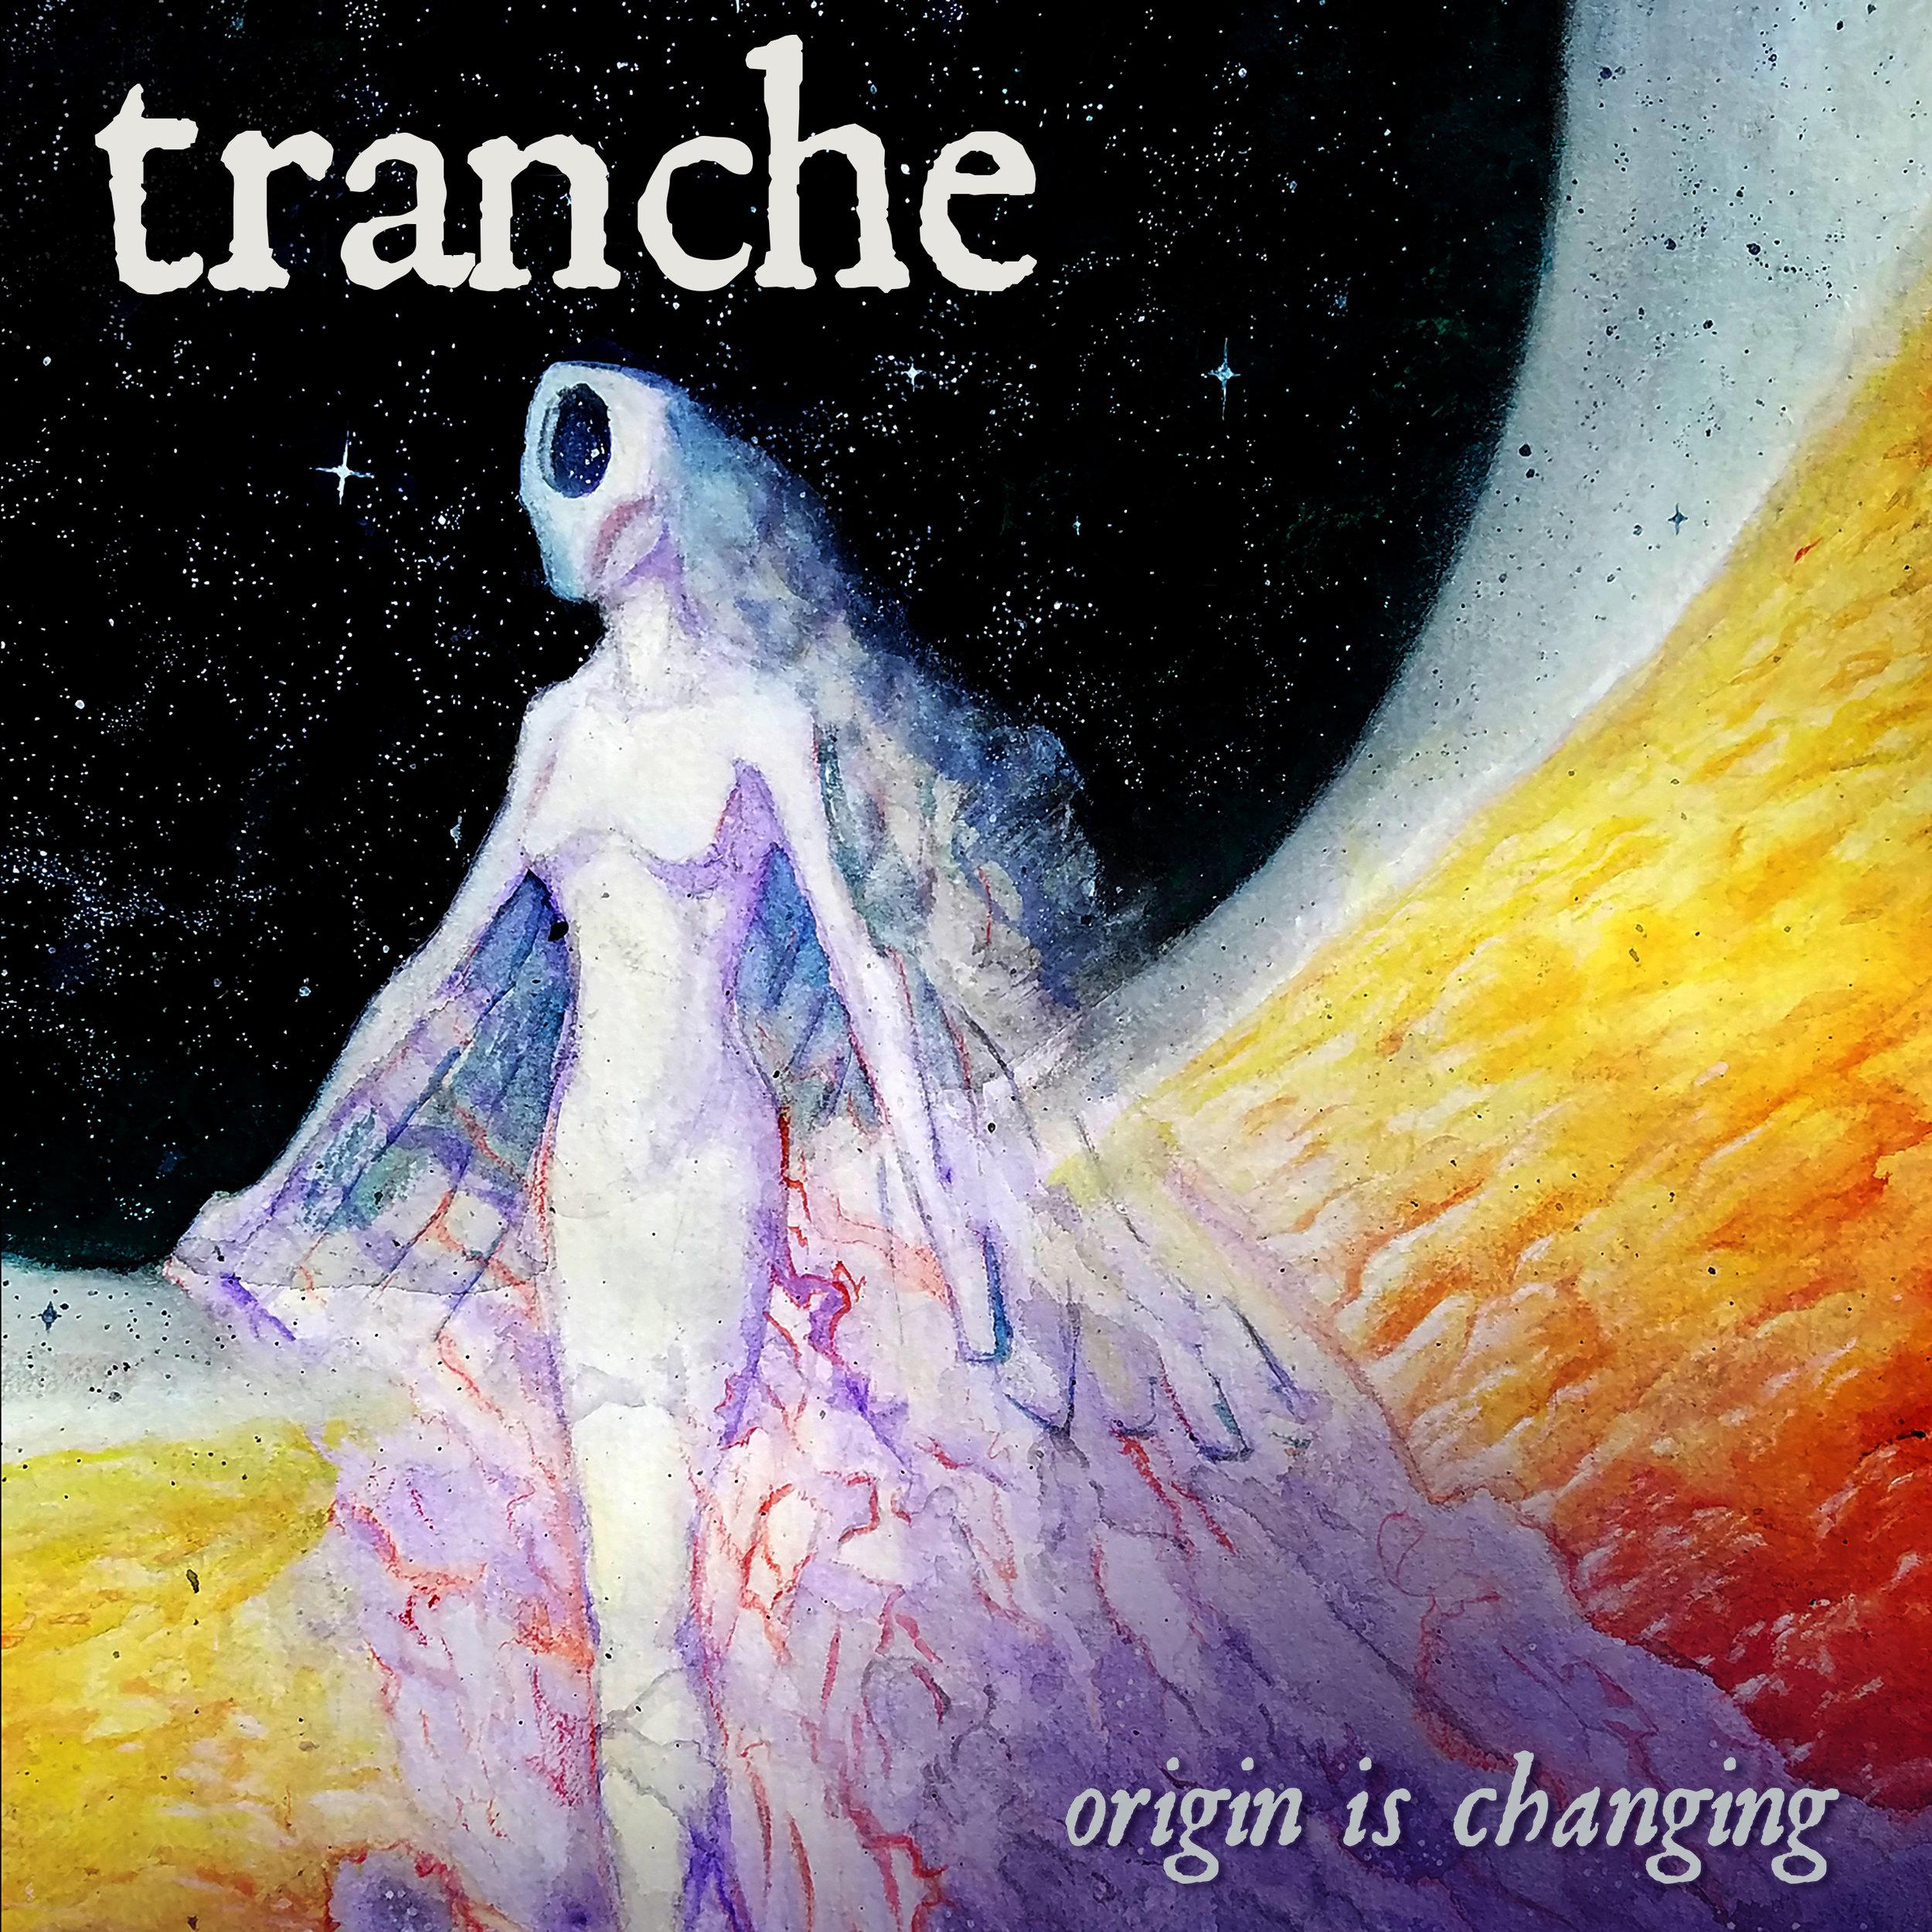 Tranche_-_Origin_is_Changing_3000x3000.jpg